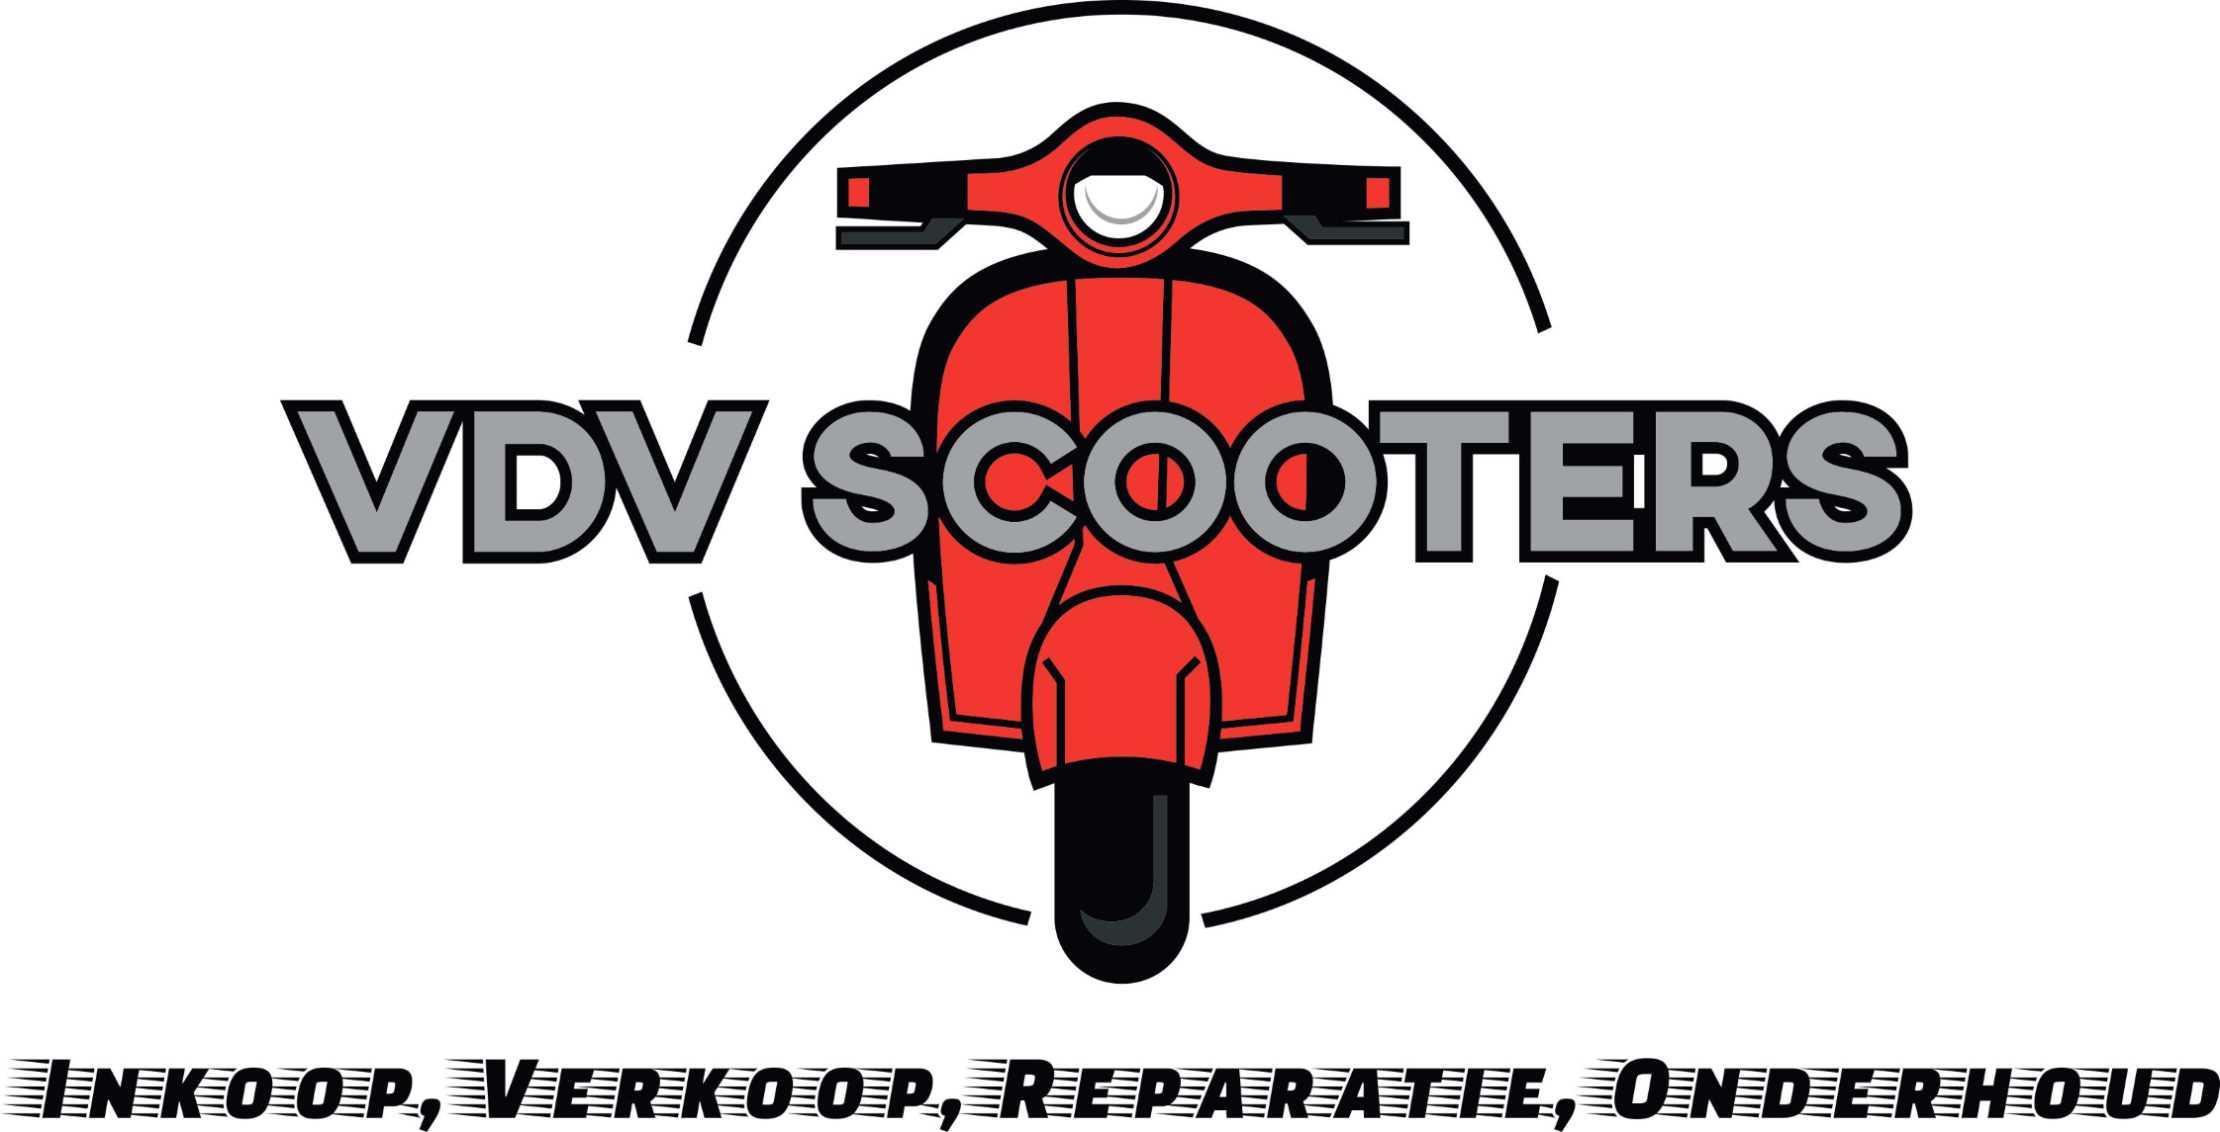 vdvscooters